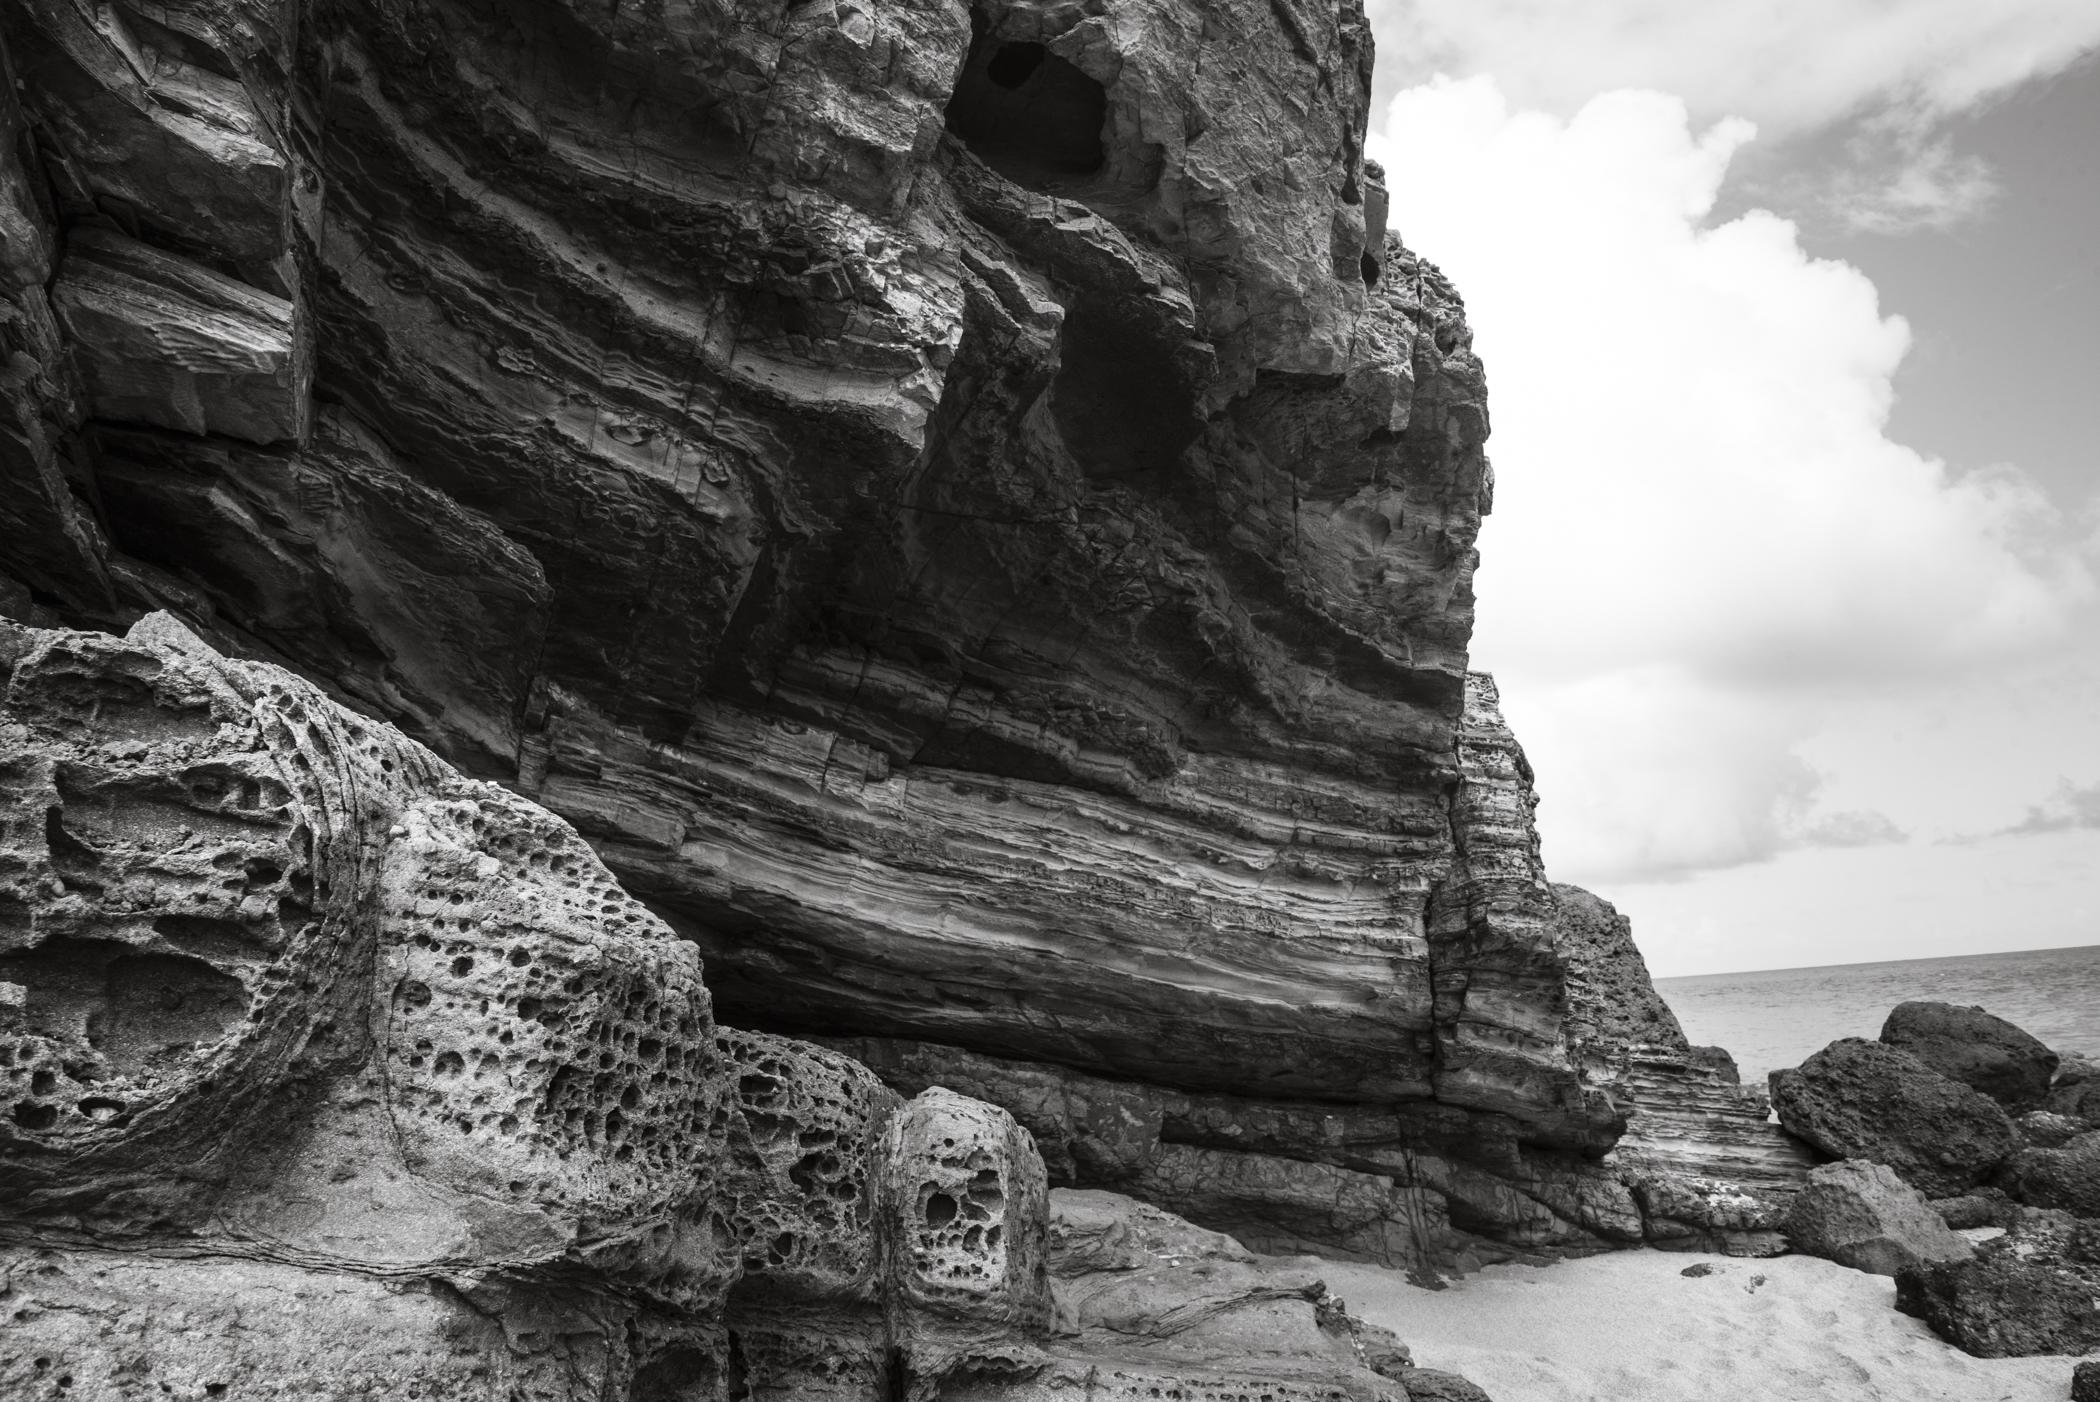 012014-Culebra-JuliaLuckettPhotography-154